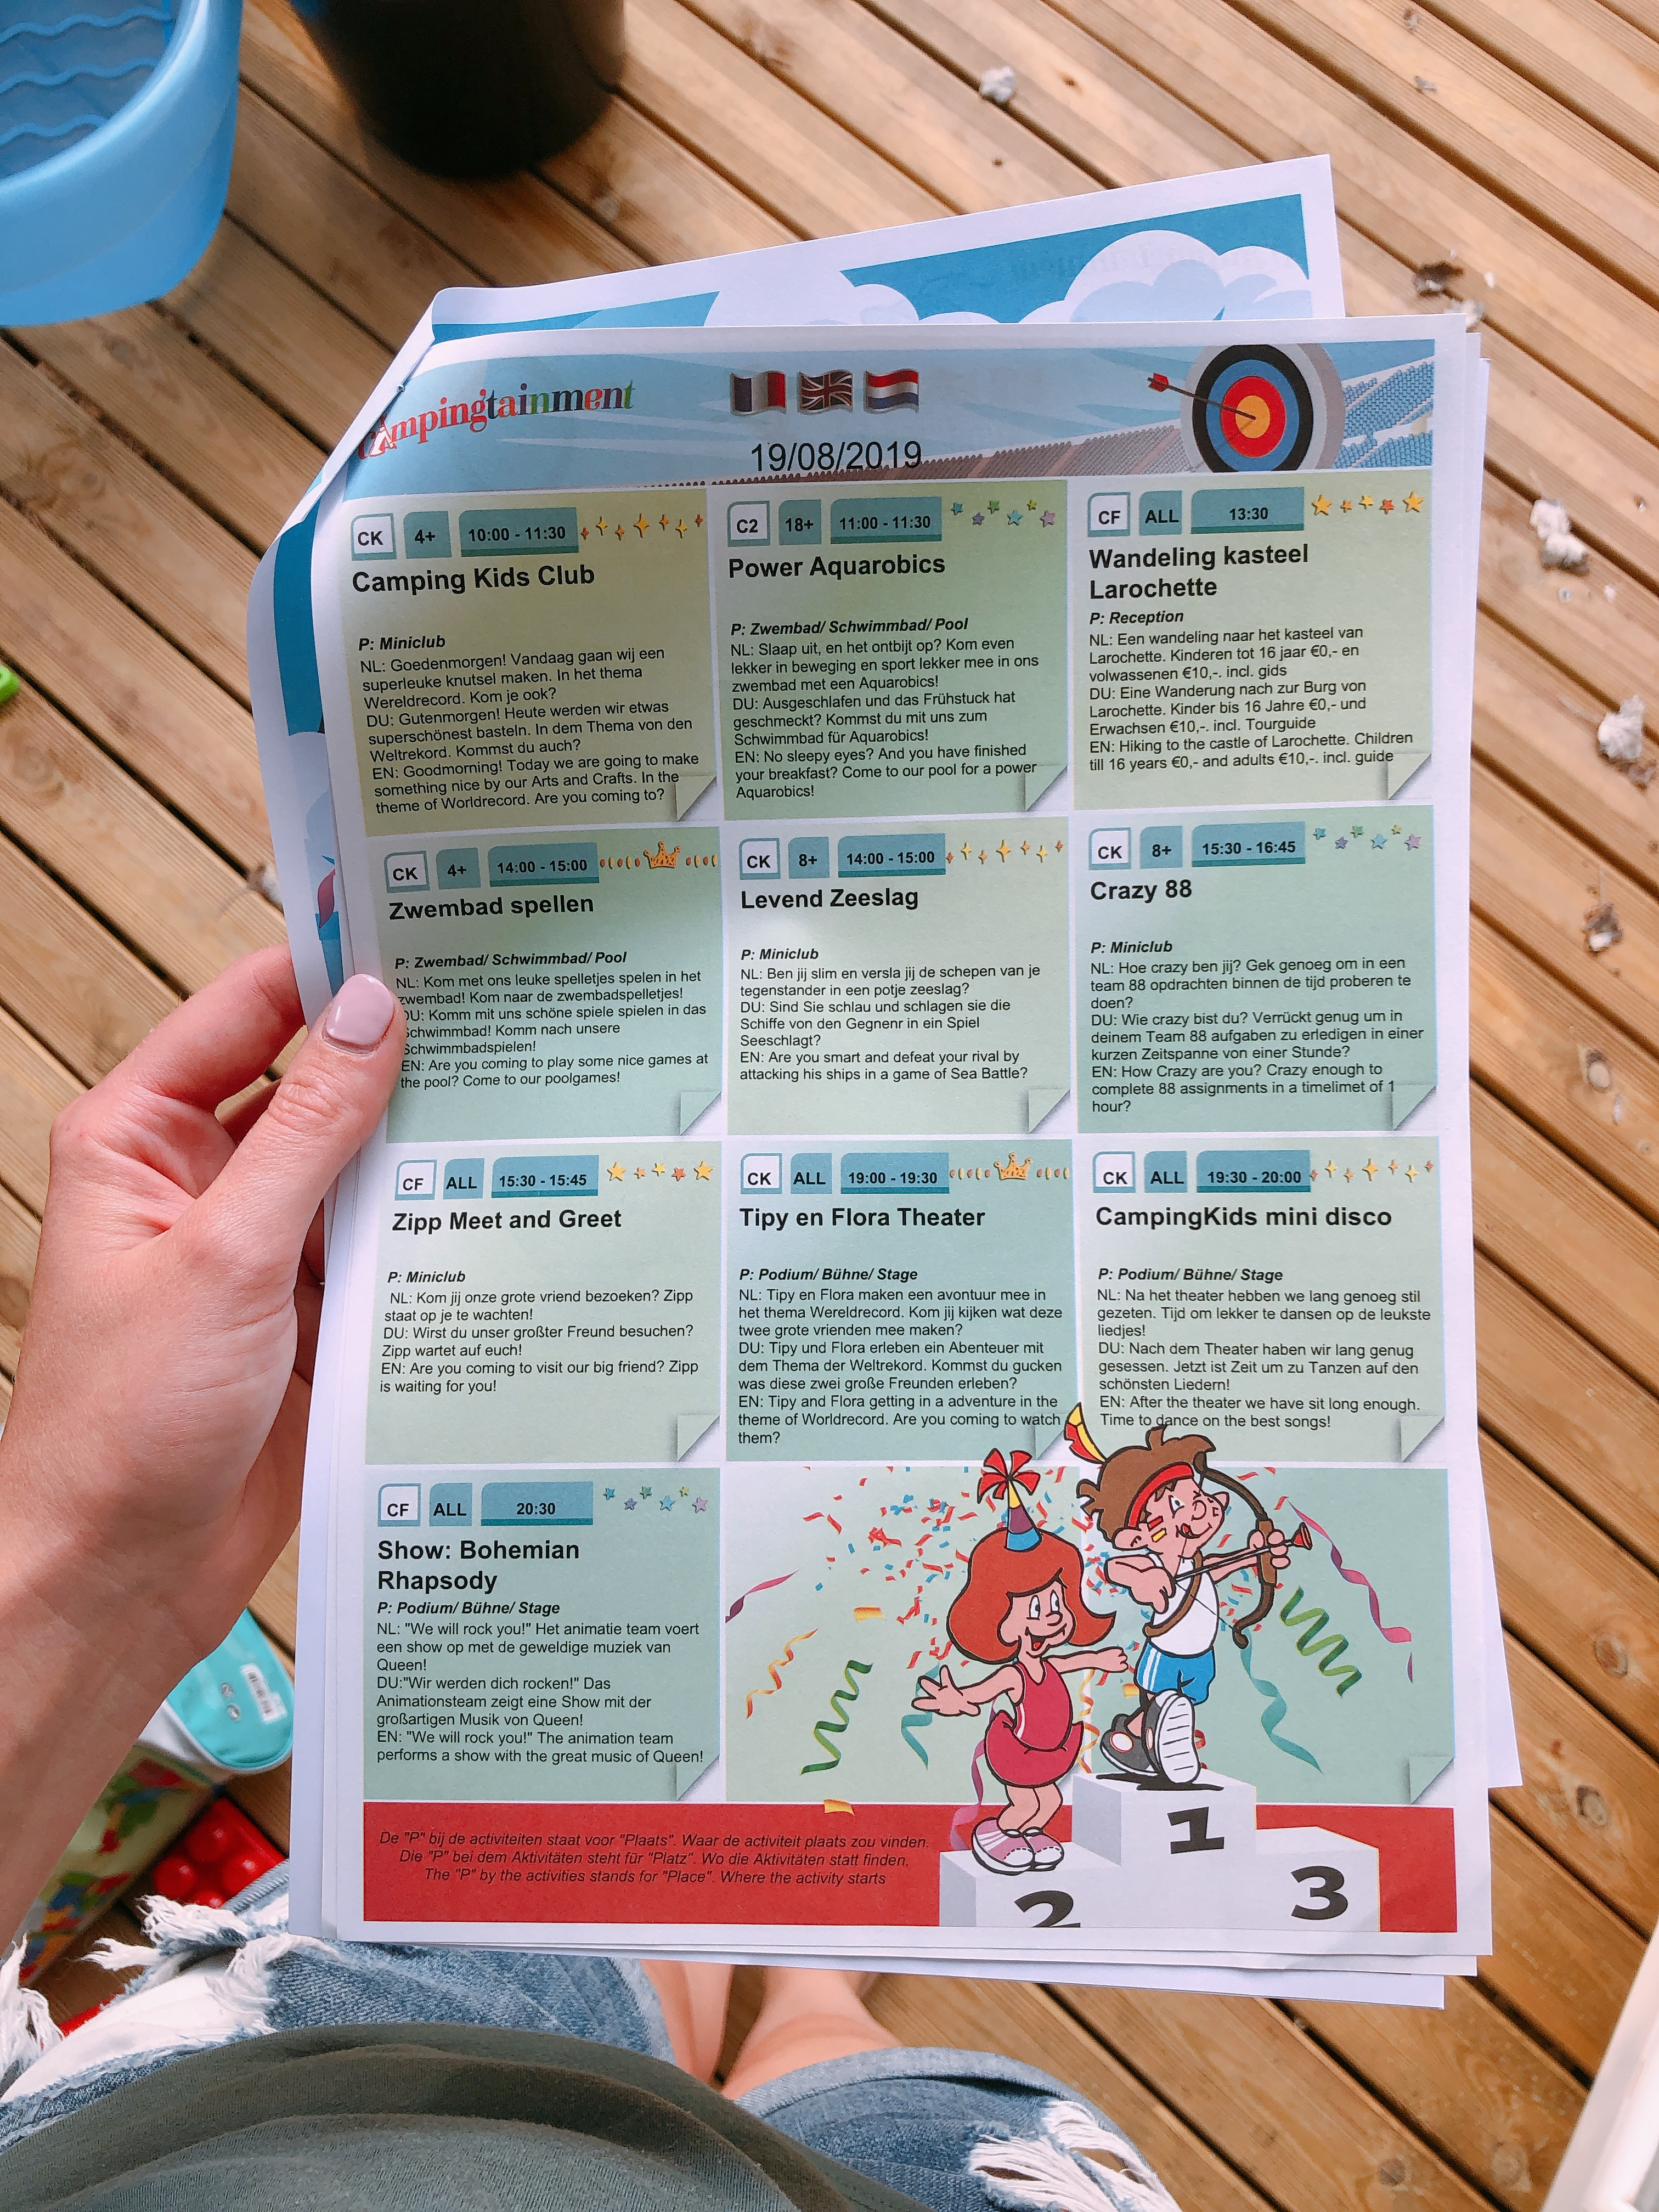 IMG 1974 - Fotodagboek Vakantie: Camping Iris Parc Birkelt in Luxemburg!